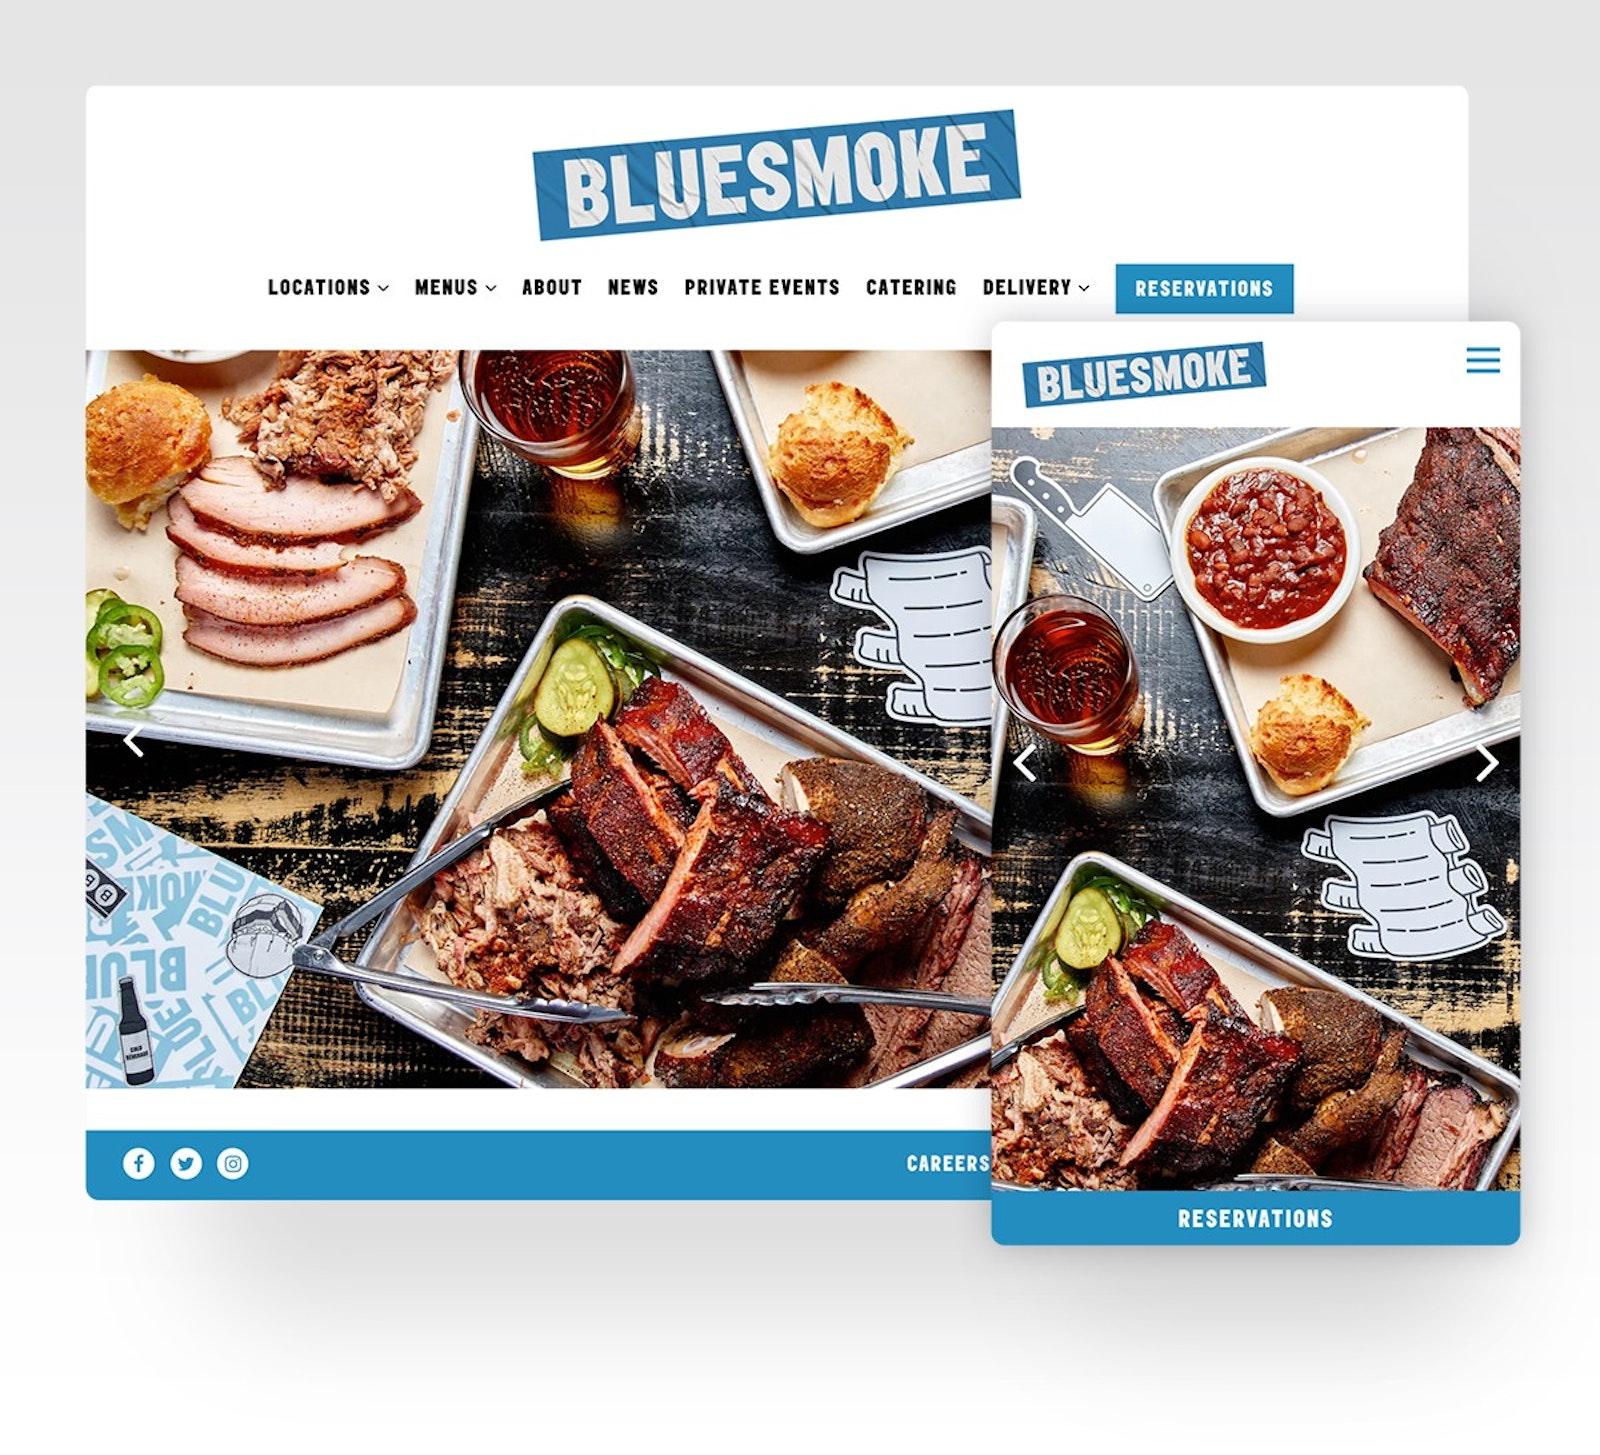 Blue Smoke's website